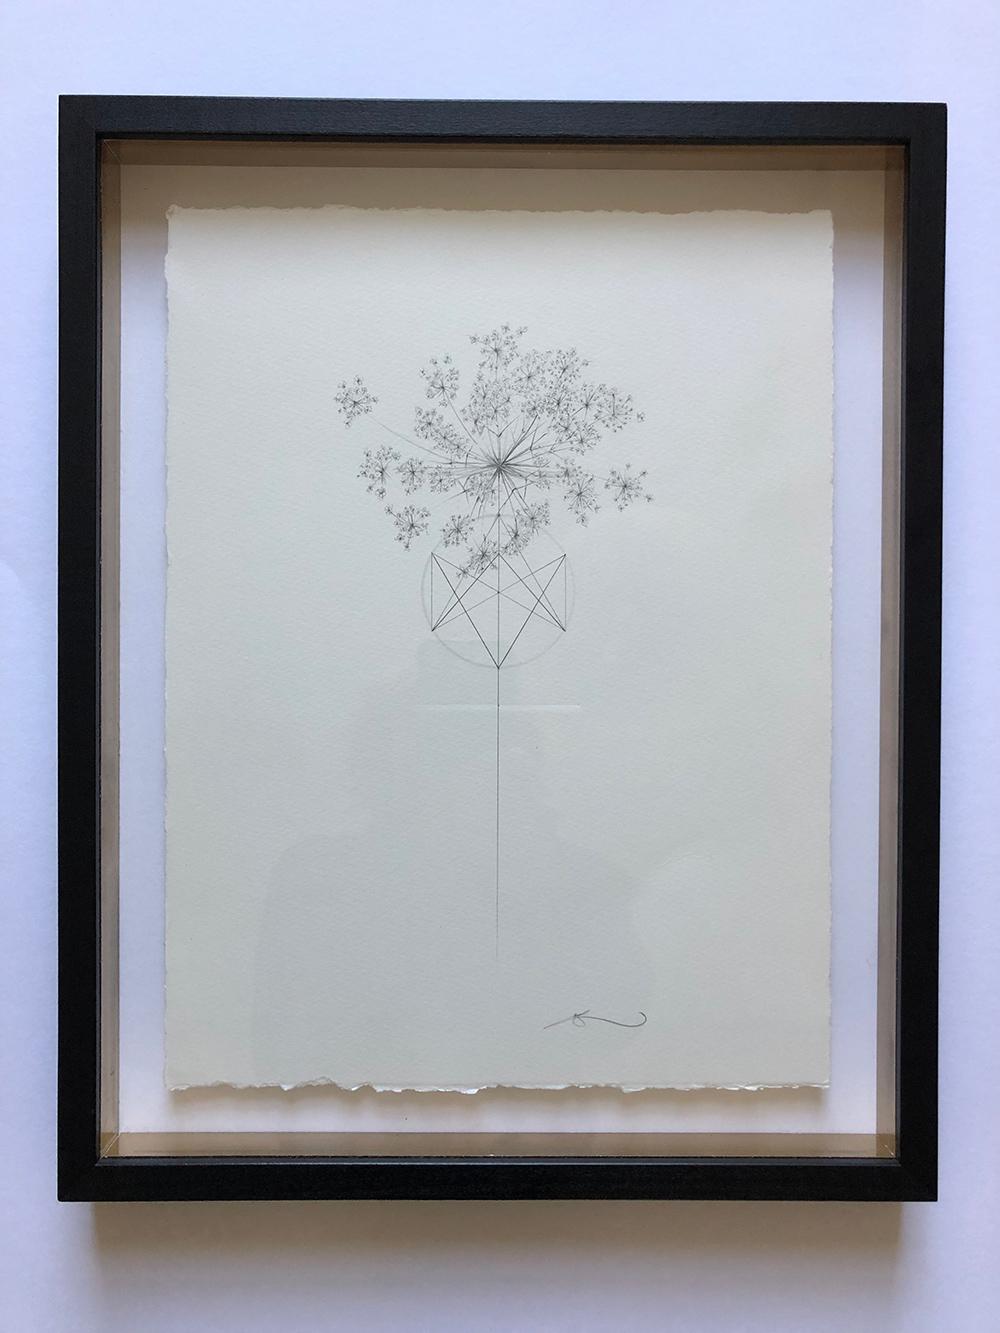 Jessica-albarn-2-meadow-flowers-3.jpg